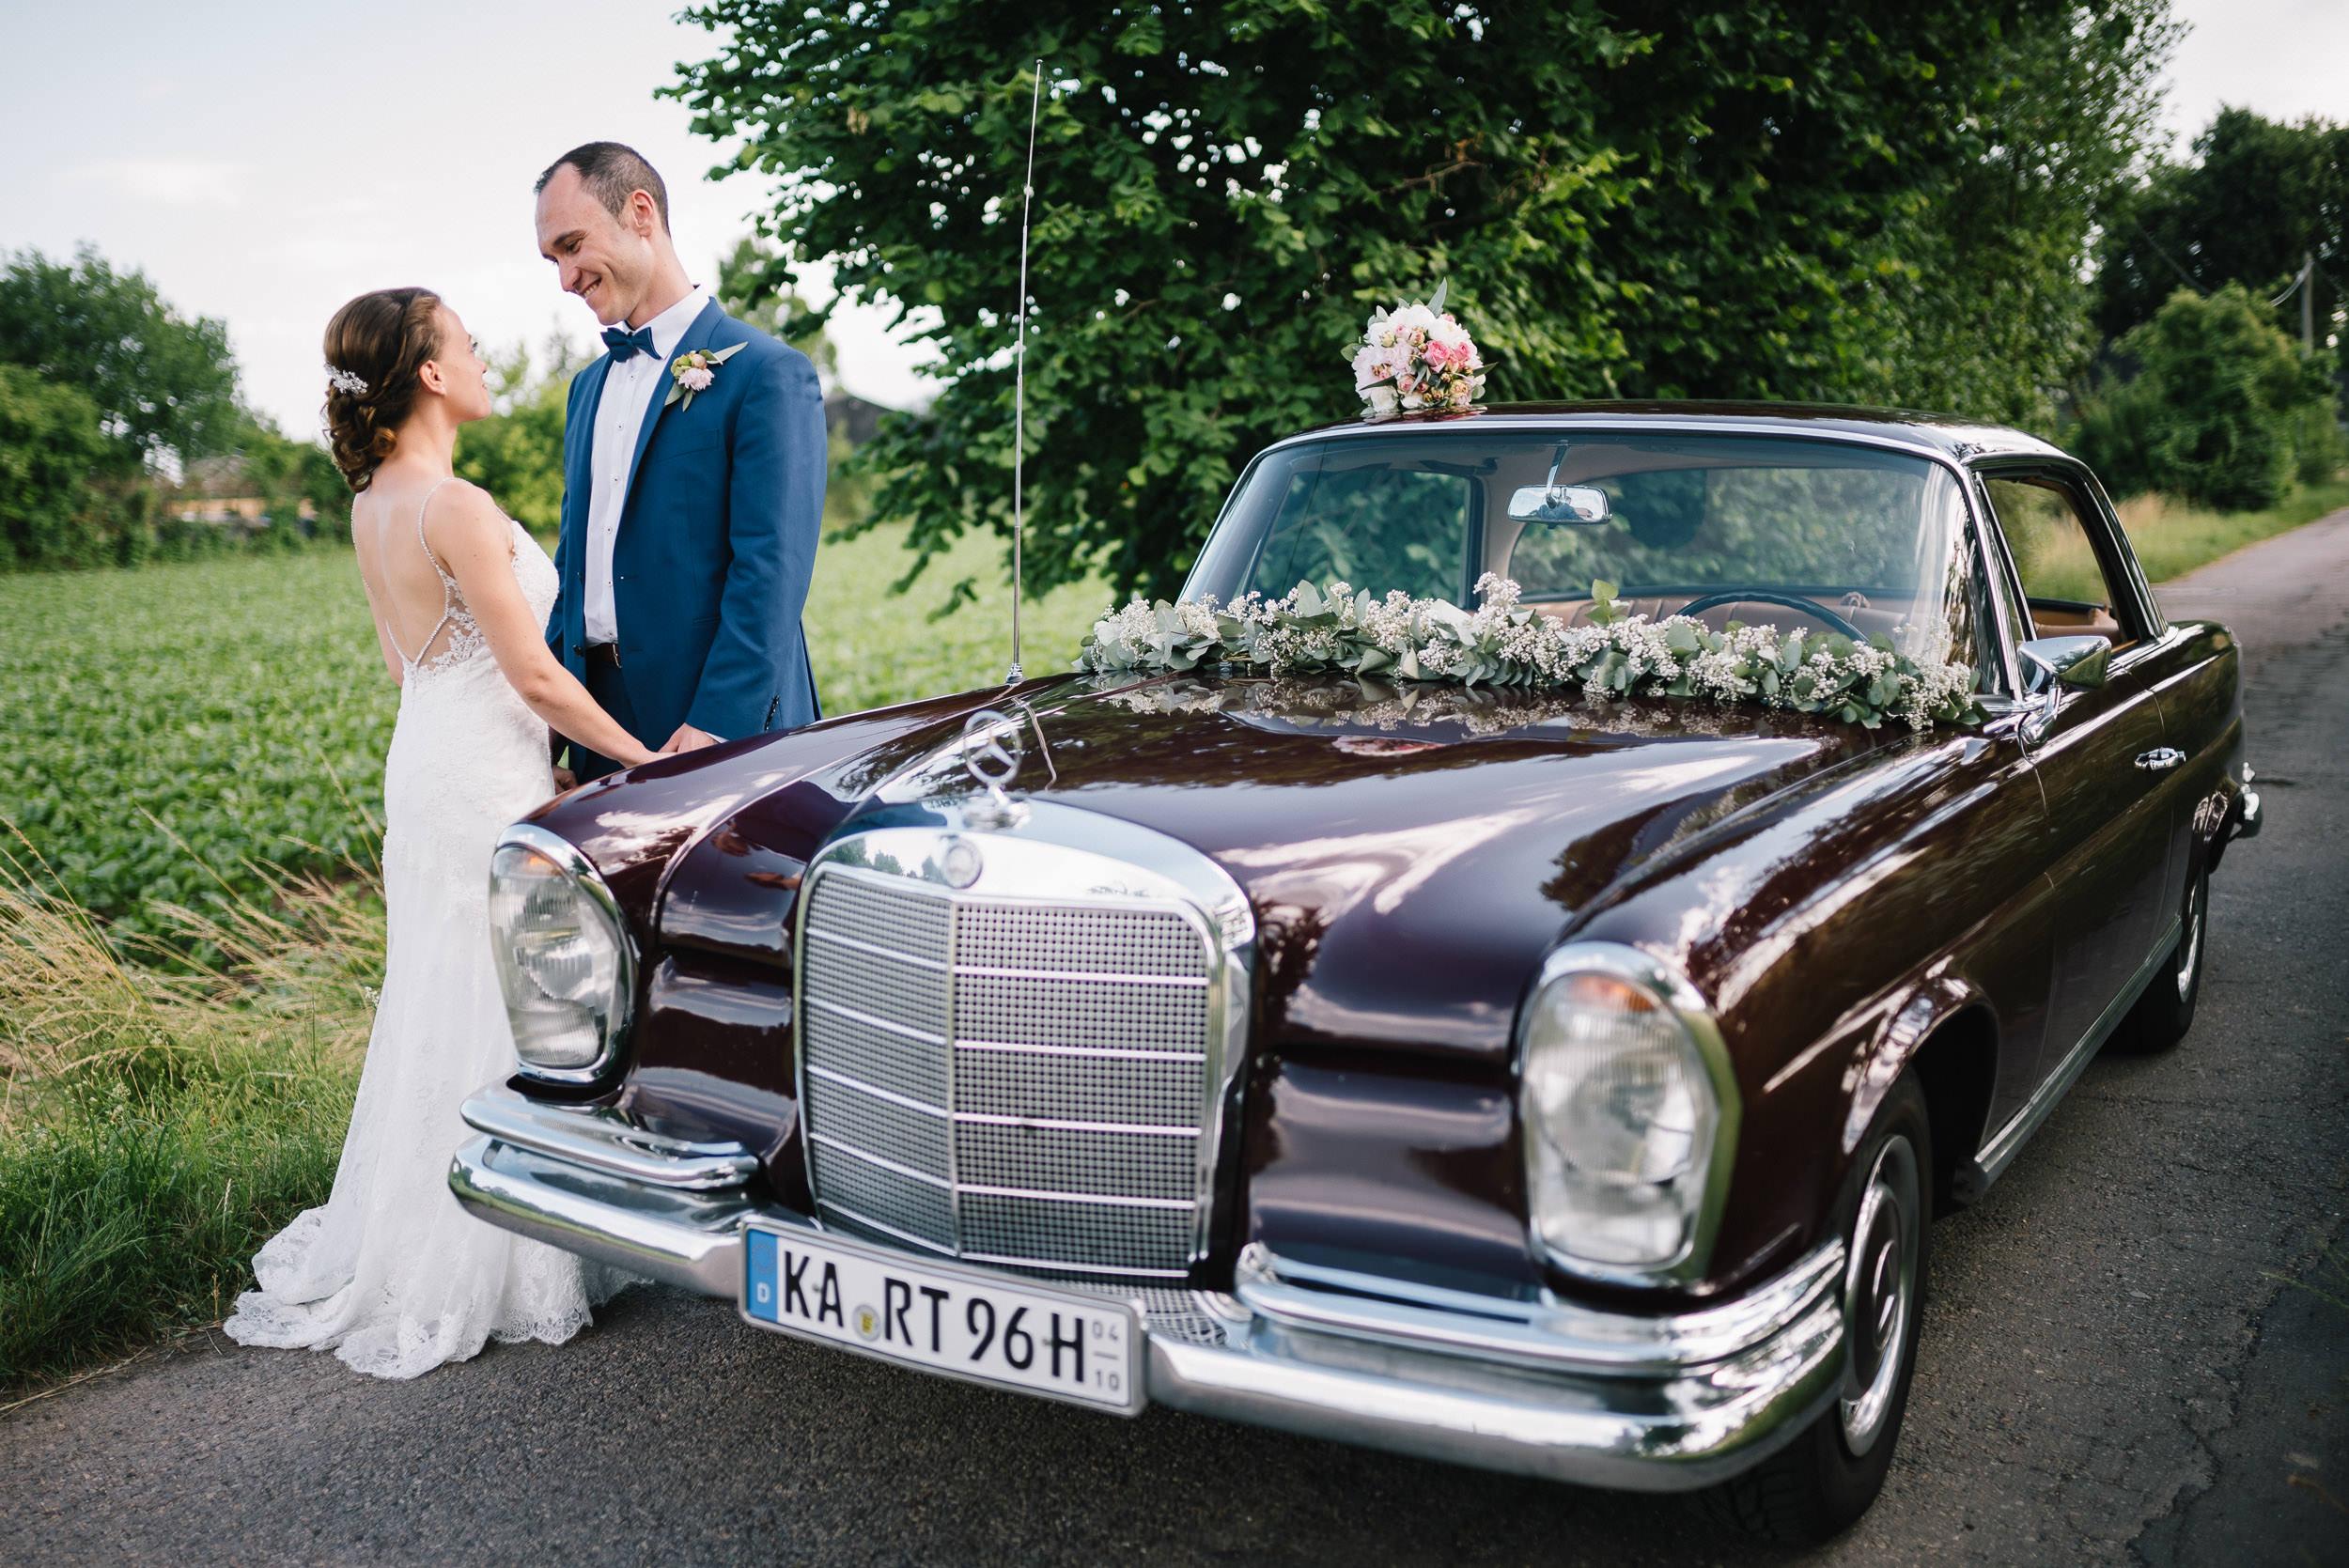 Hochzeit-Julia+Lars-Leimen+Bonsaizentrum-HD-046.jpg